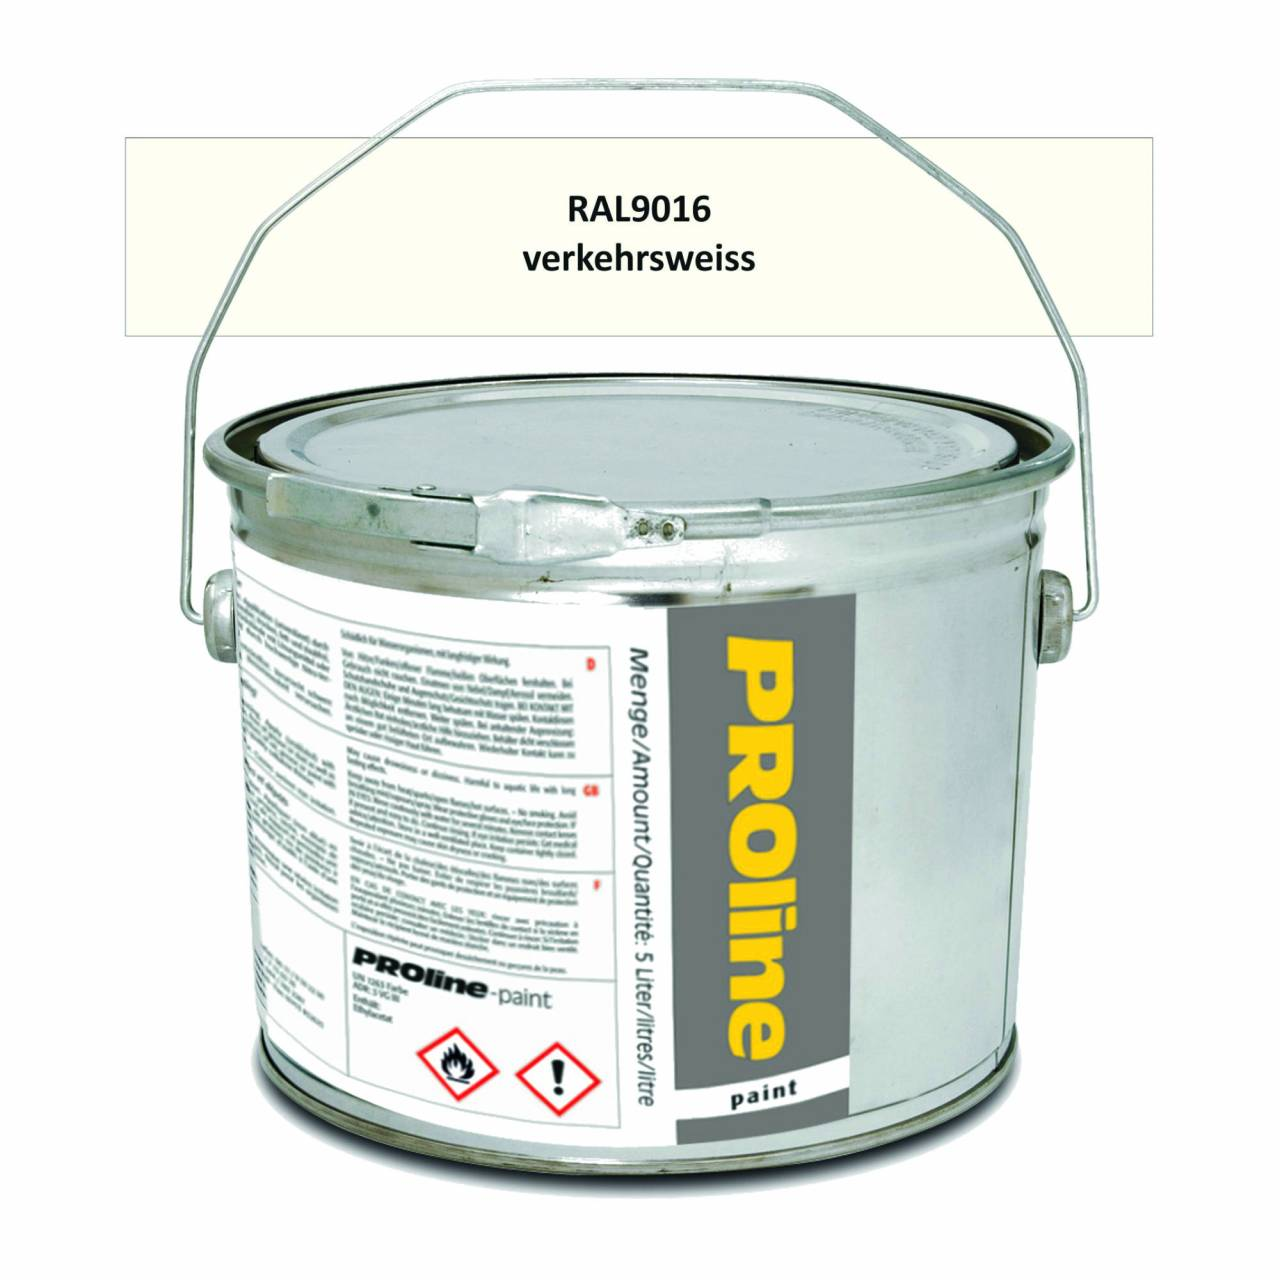 Hallen-Markierfarbe 'PROline-paint' WEISS / Eimer a 5,0 Liter